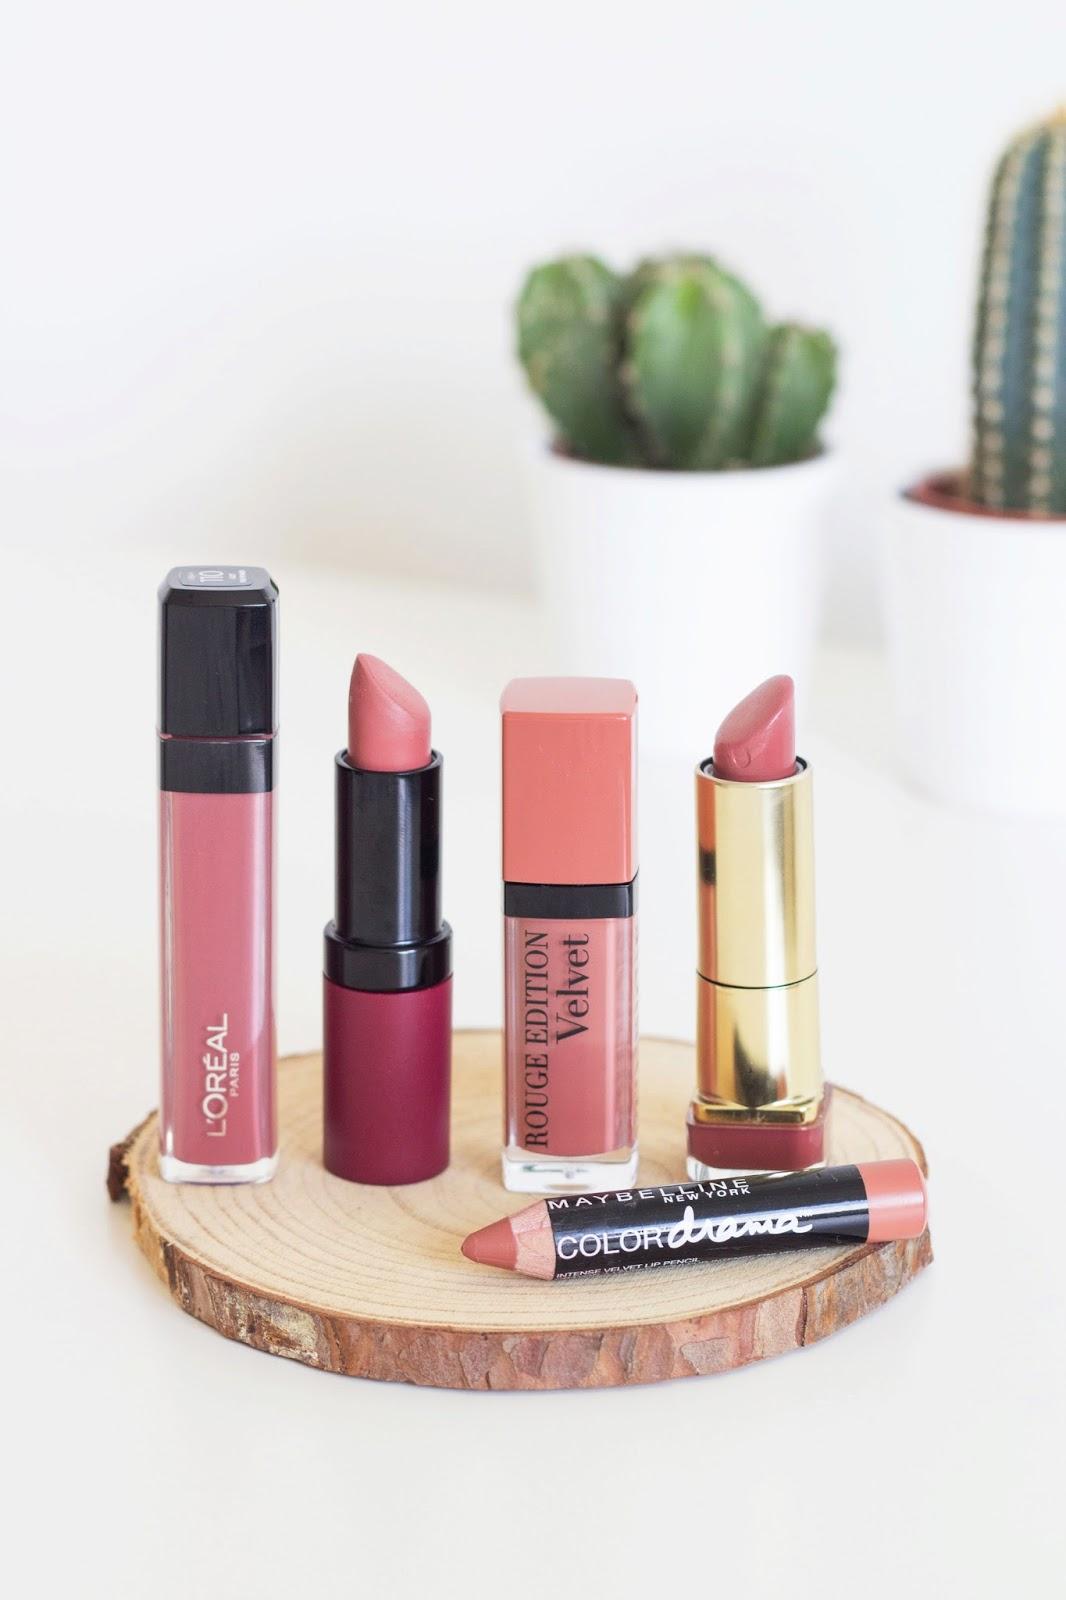 kali's inspiration: Top 5 Favorite Nude Lipsticks